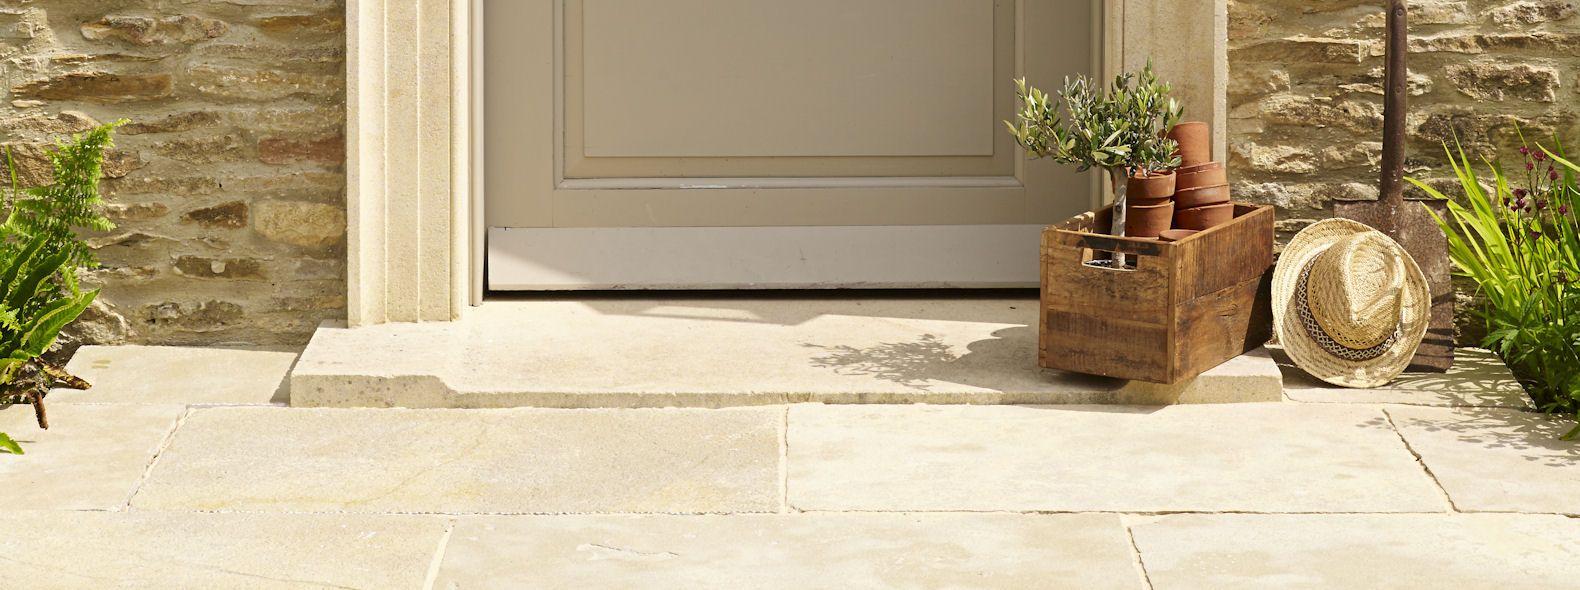 outdoor stone cobbles hertford st pinterest stone gardens